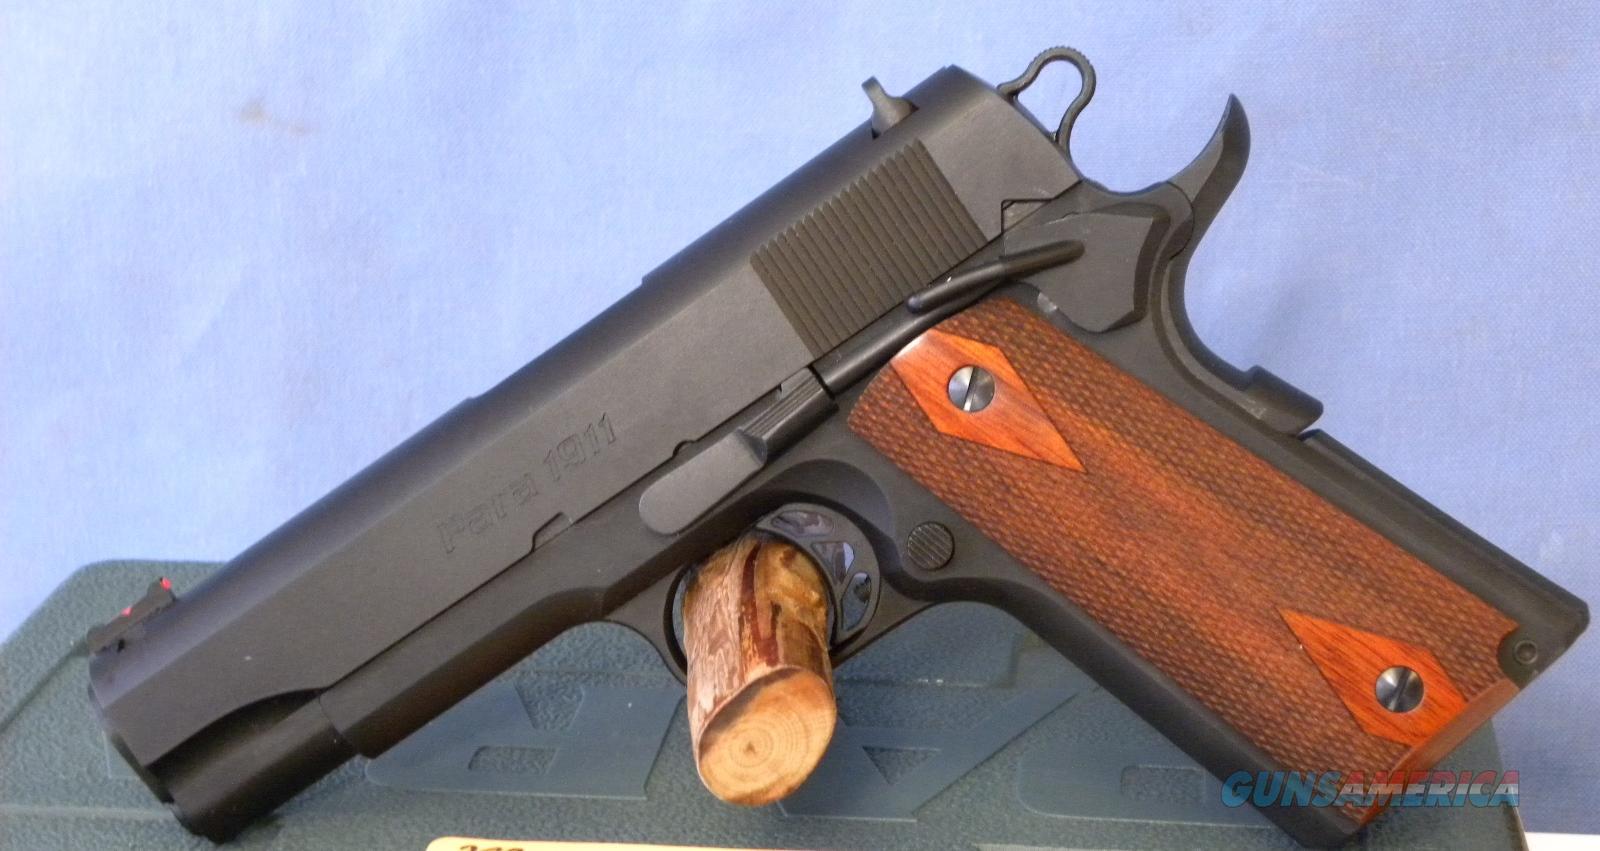 Para 1911 GI LTC Commander 96740  Guns > Pistols > Para Ordnance Pistols